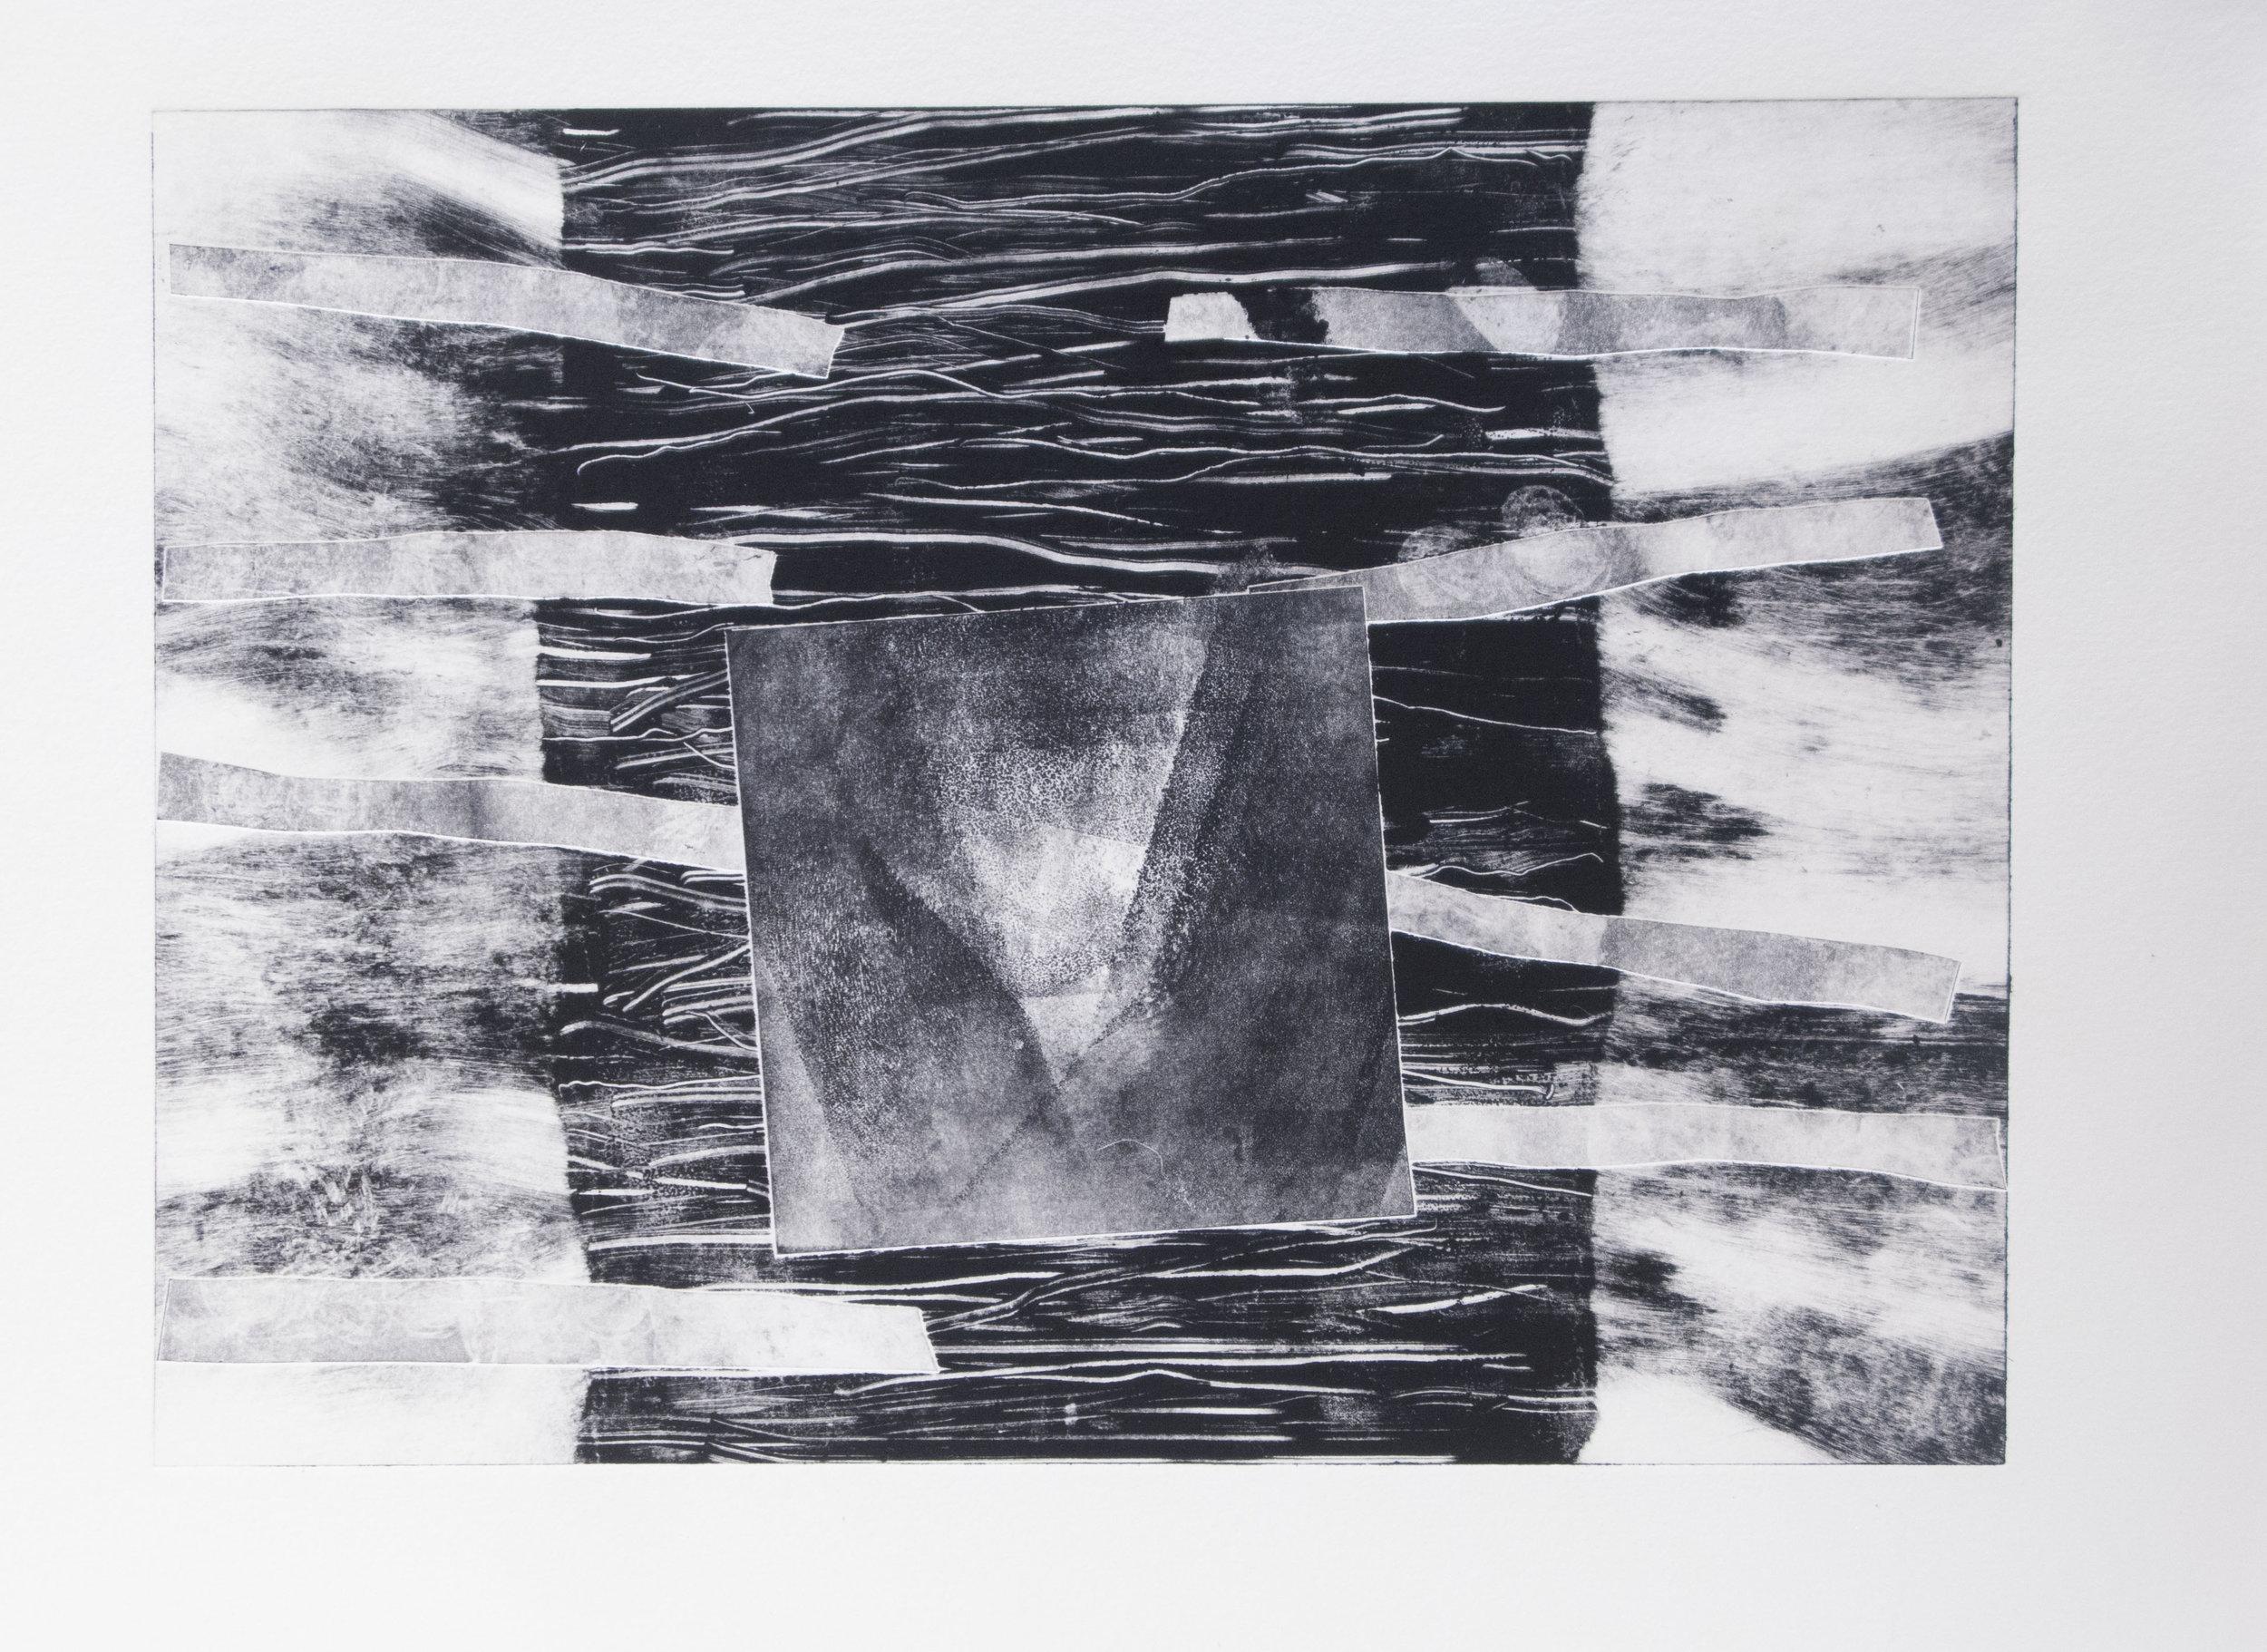 Forms on black 17 (32cm x 26 cm)